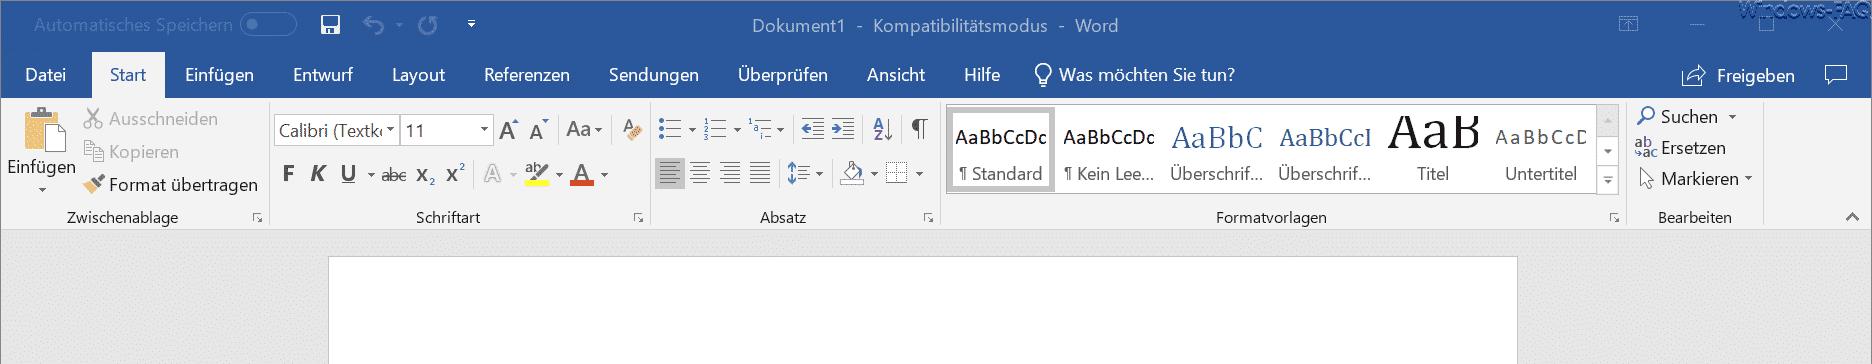 Word 365 altes Design